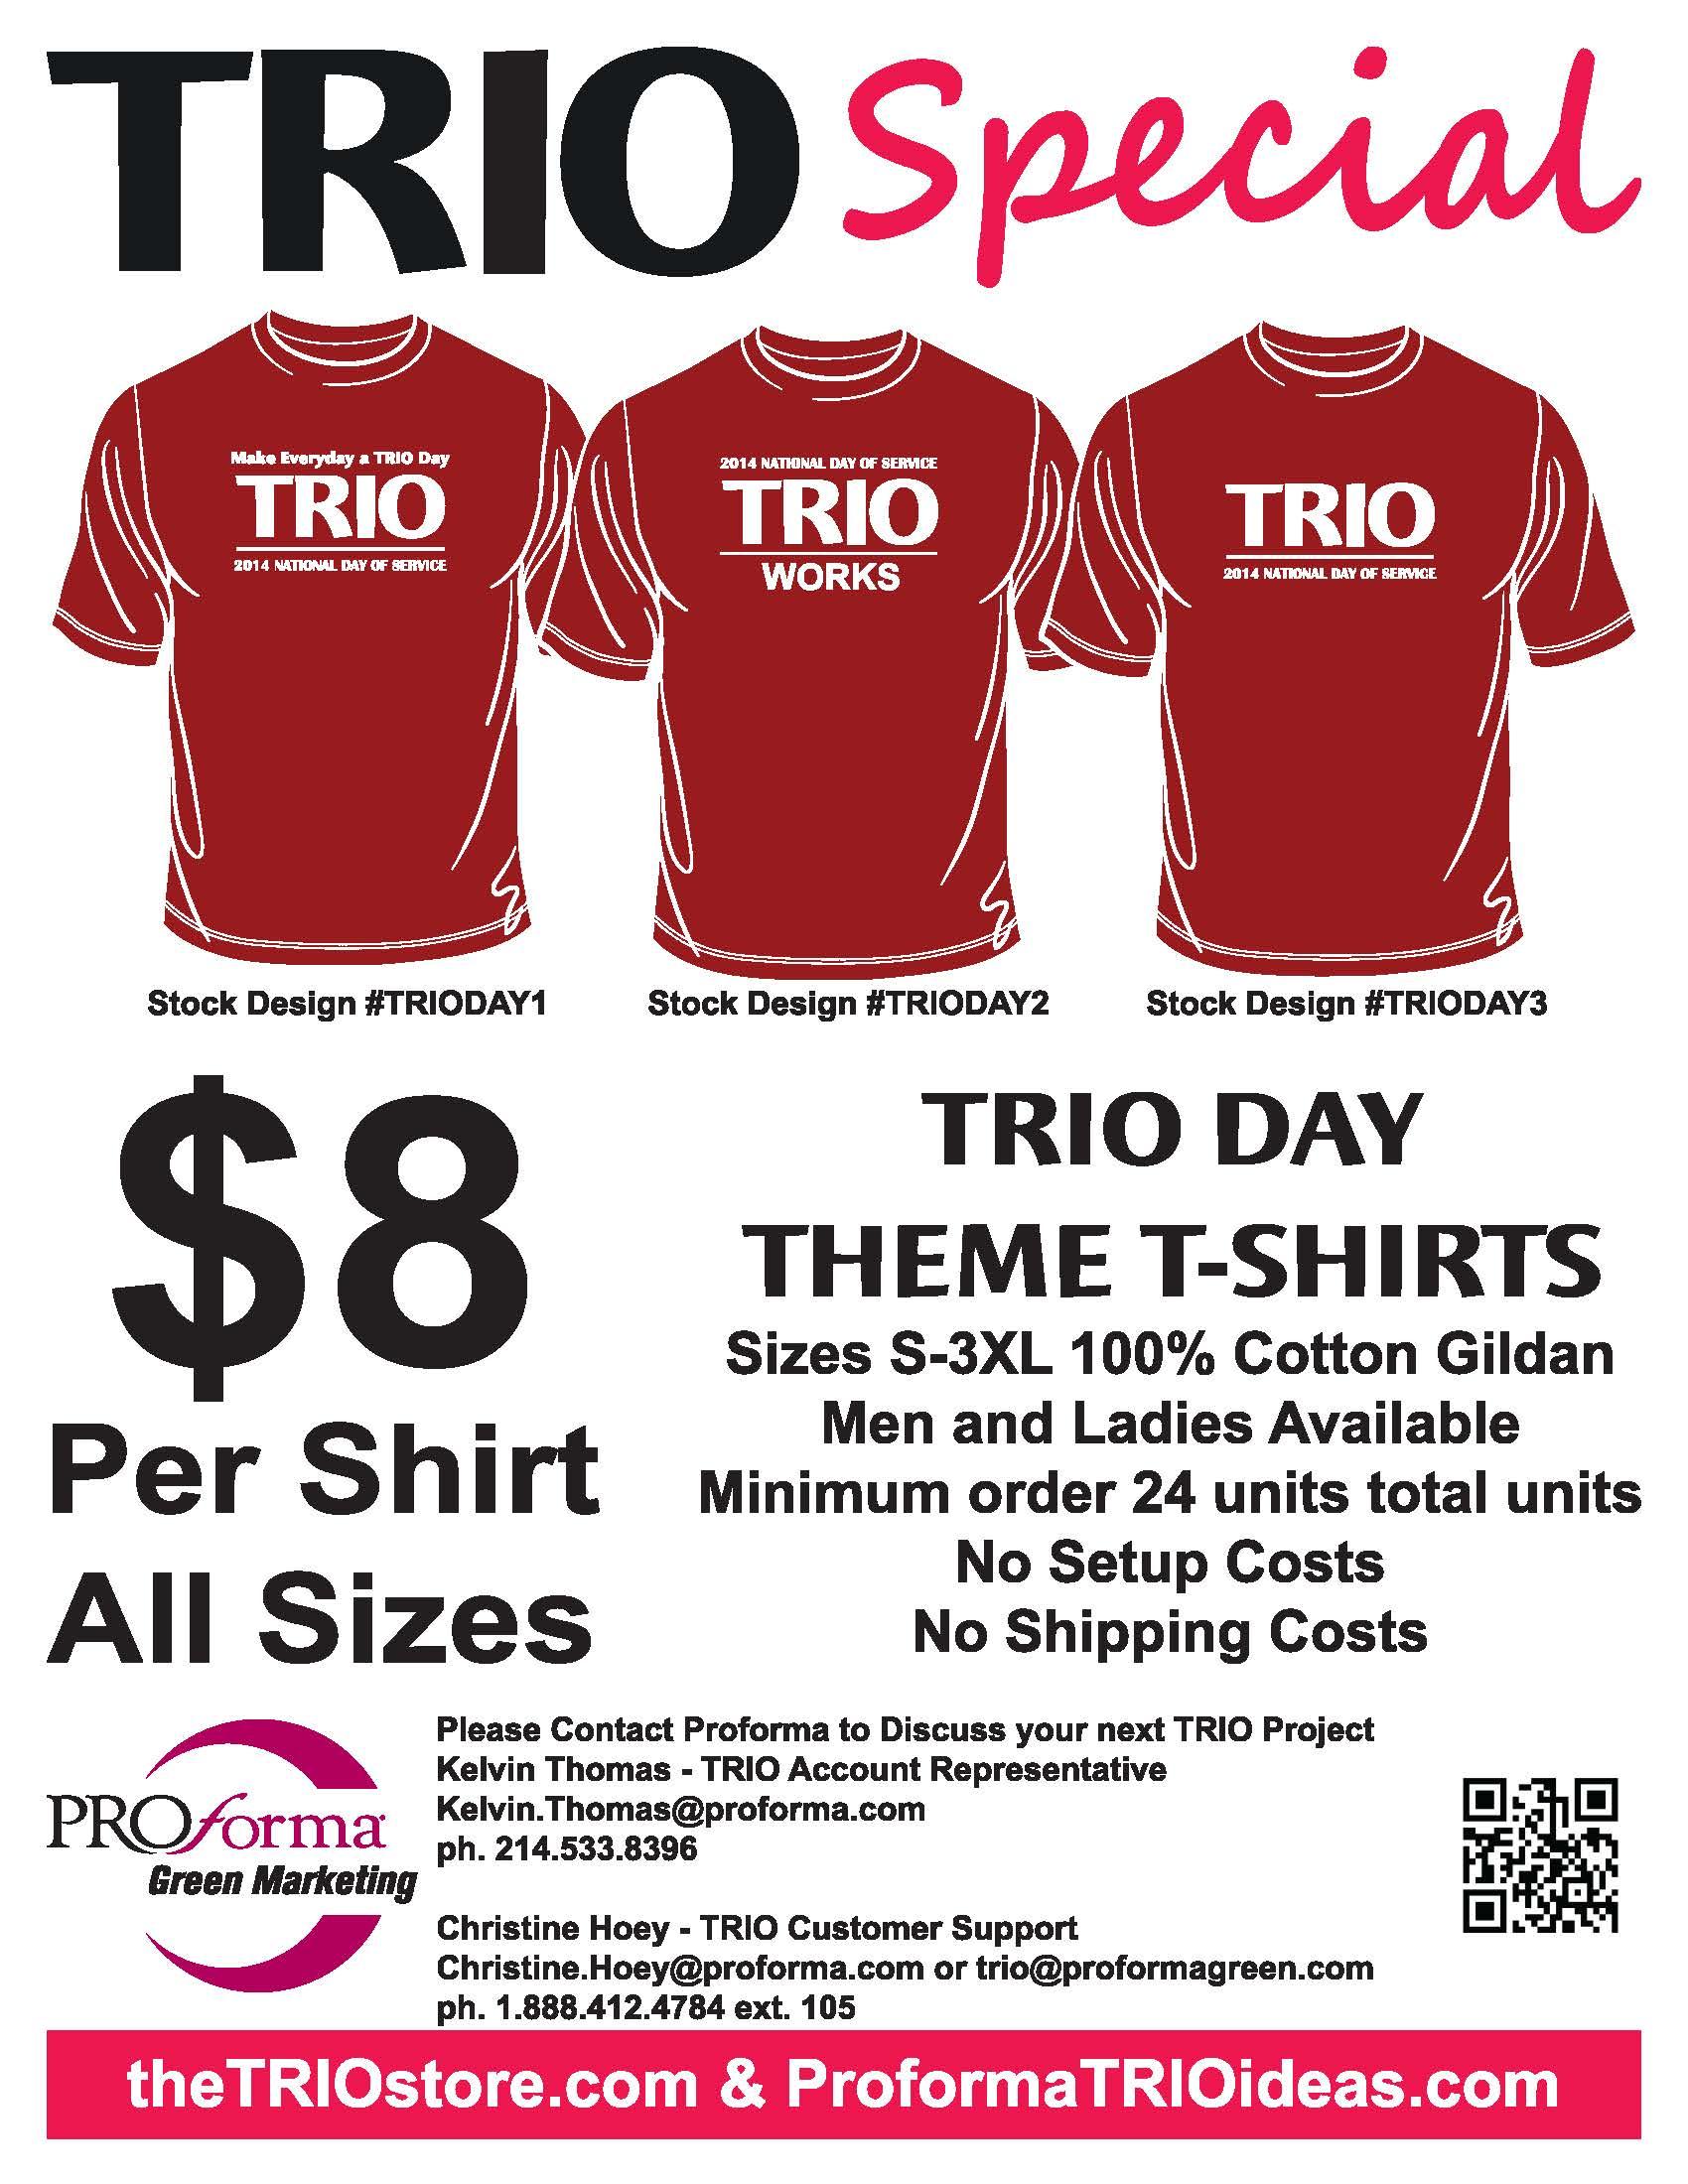 Trio Day Tee Shirts